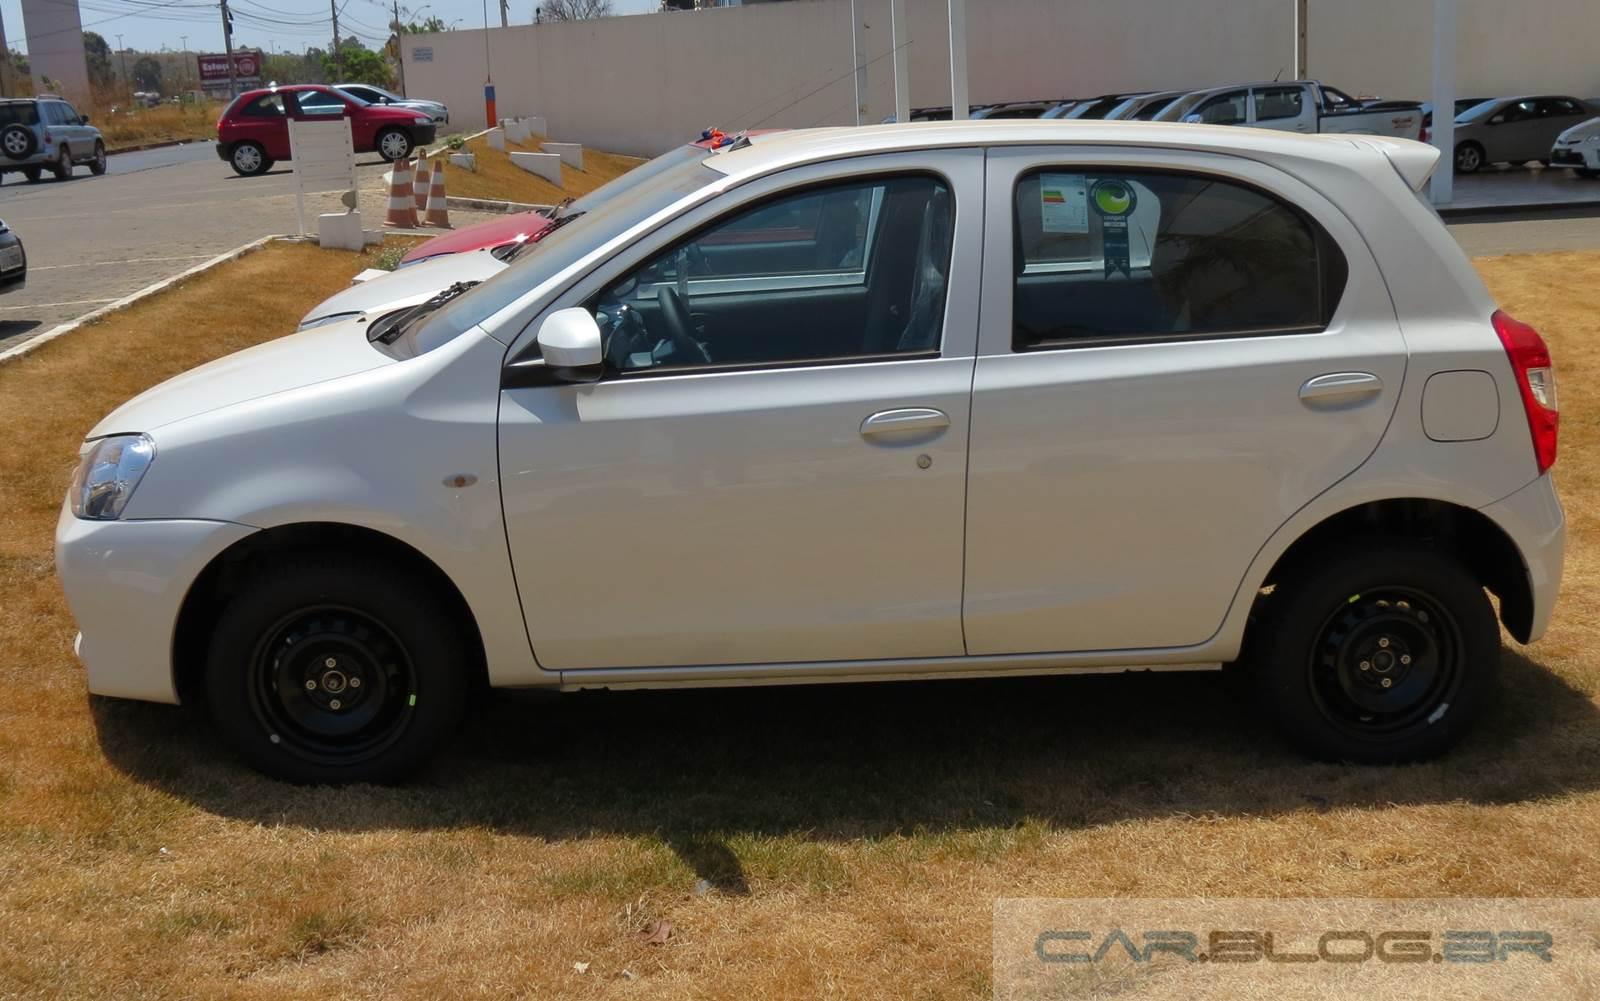 Toyota Etios 2015 Fotos Precos Eon 2014 Toyota Corolla S Interior